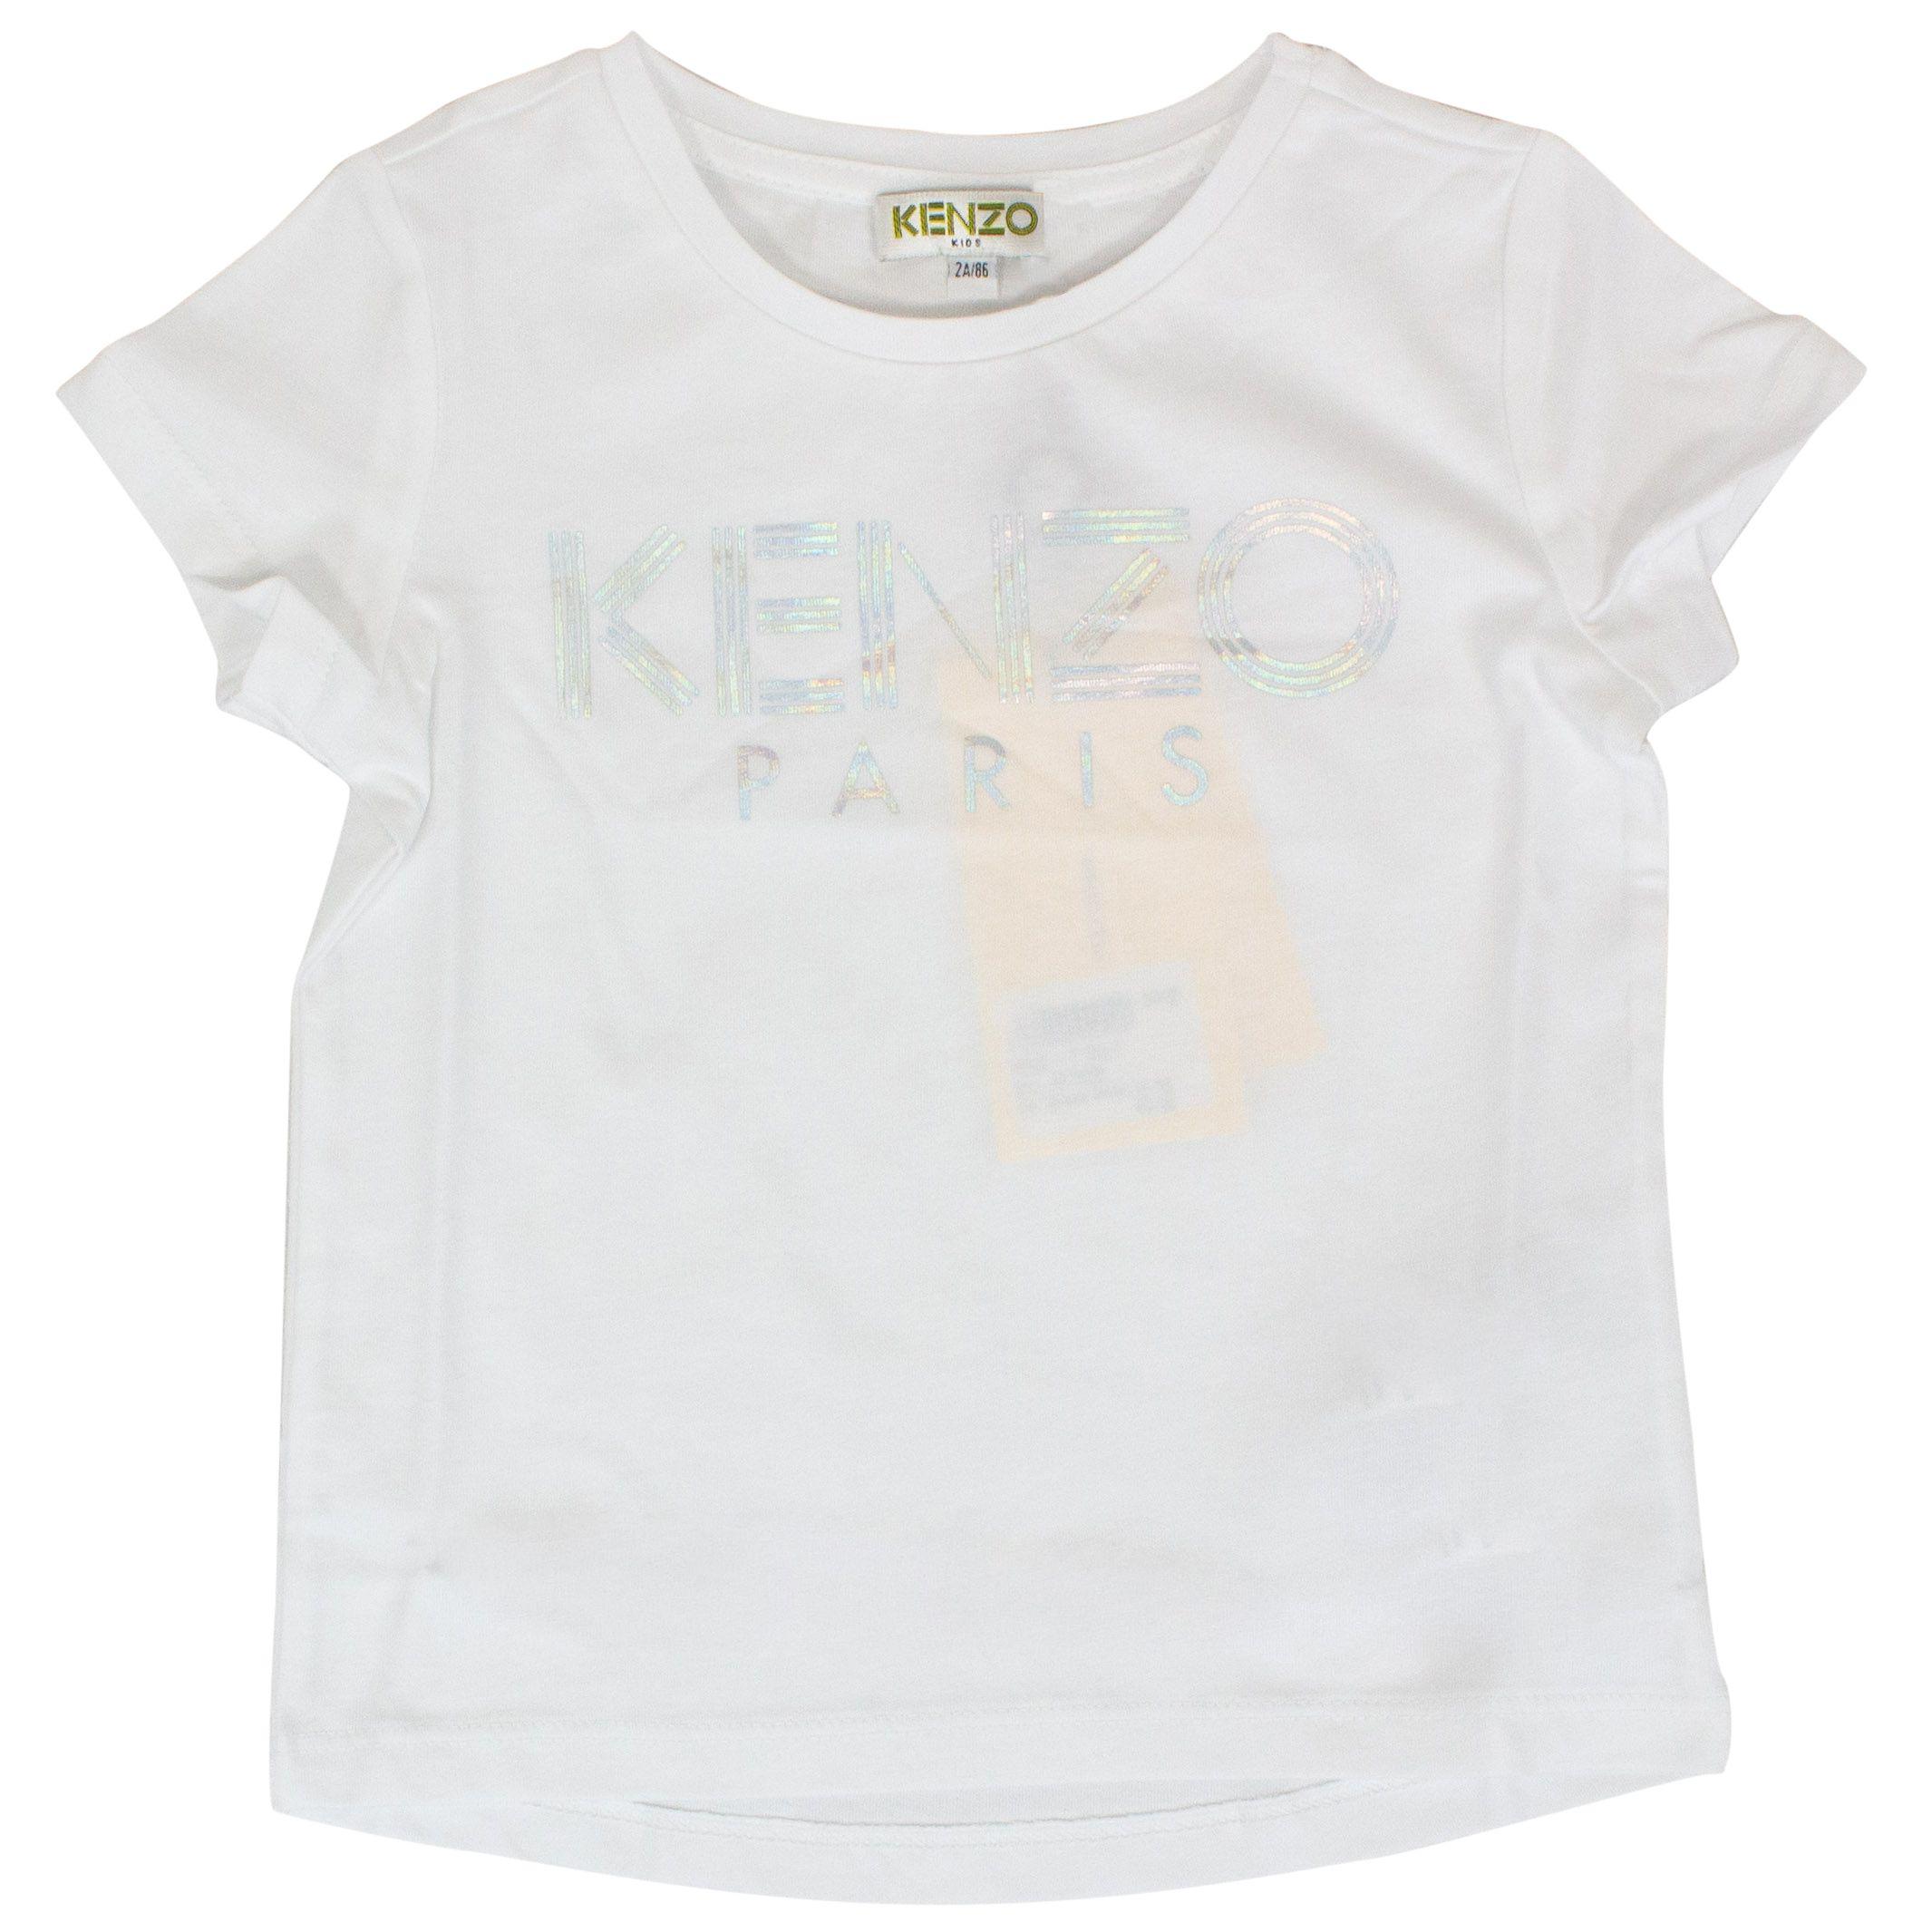 20b1093c T-shirt with laminated logo print